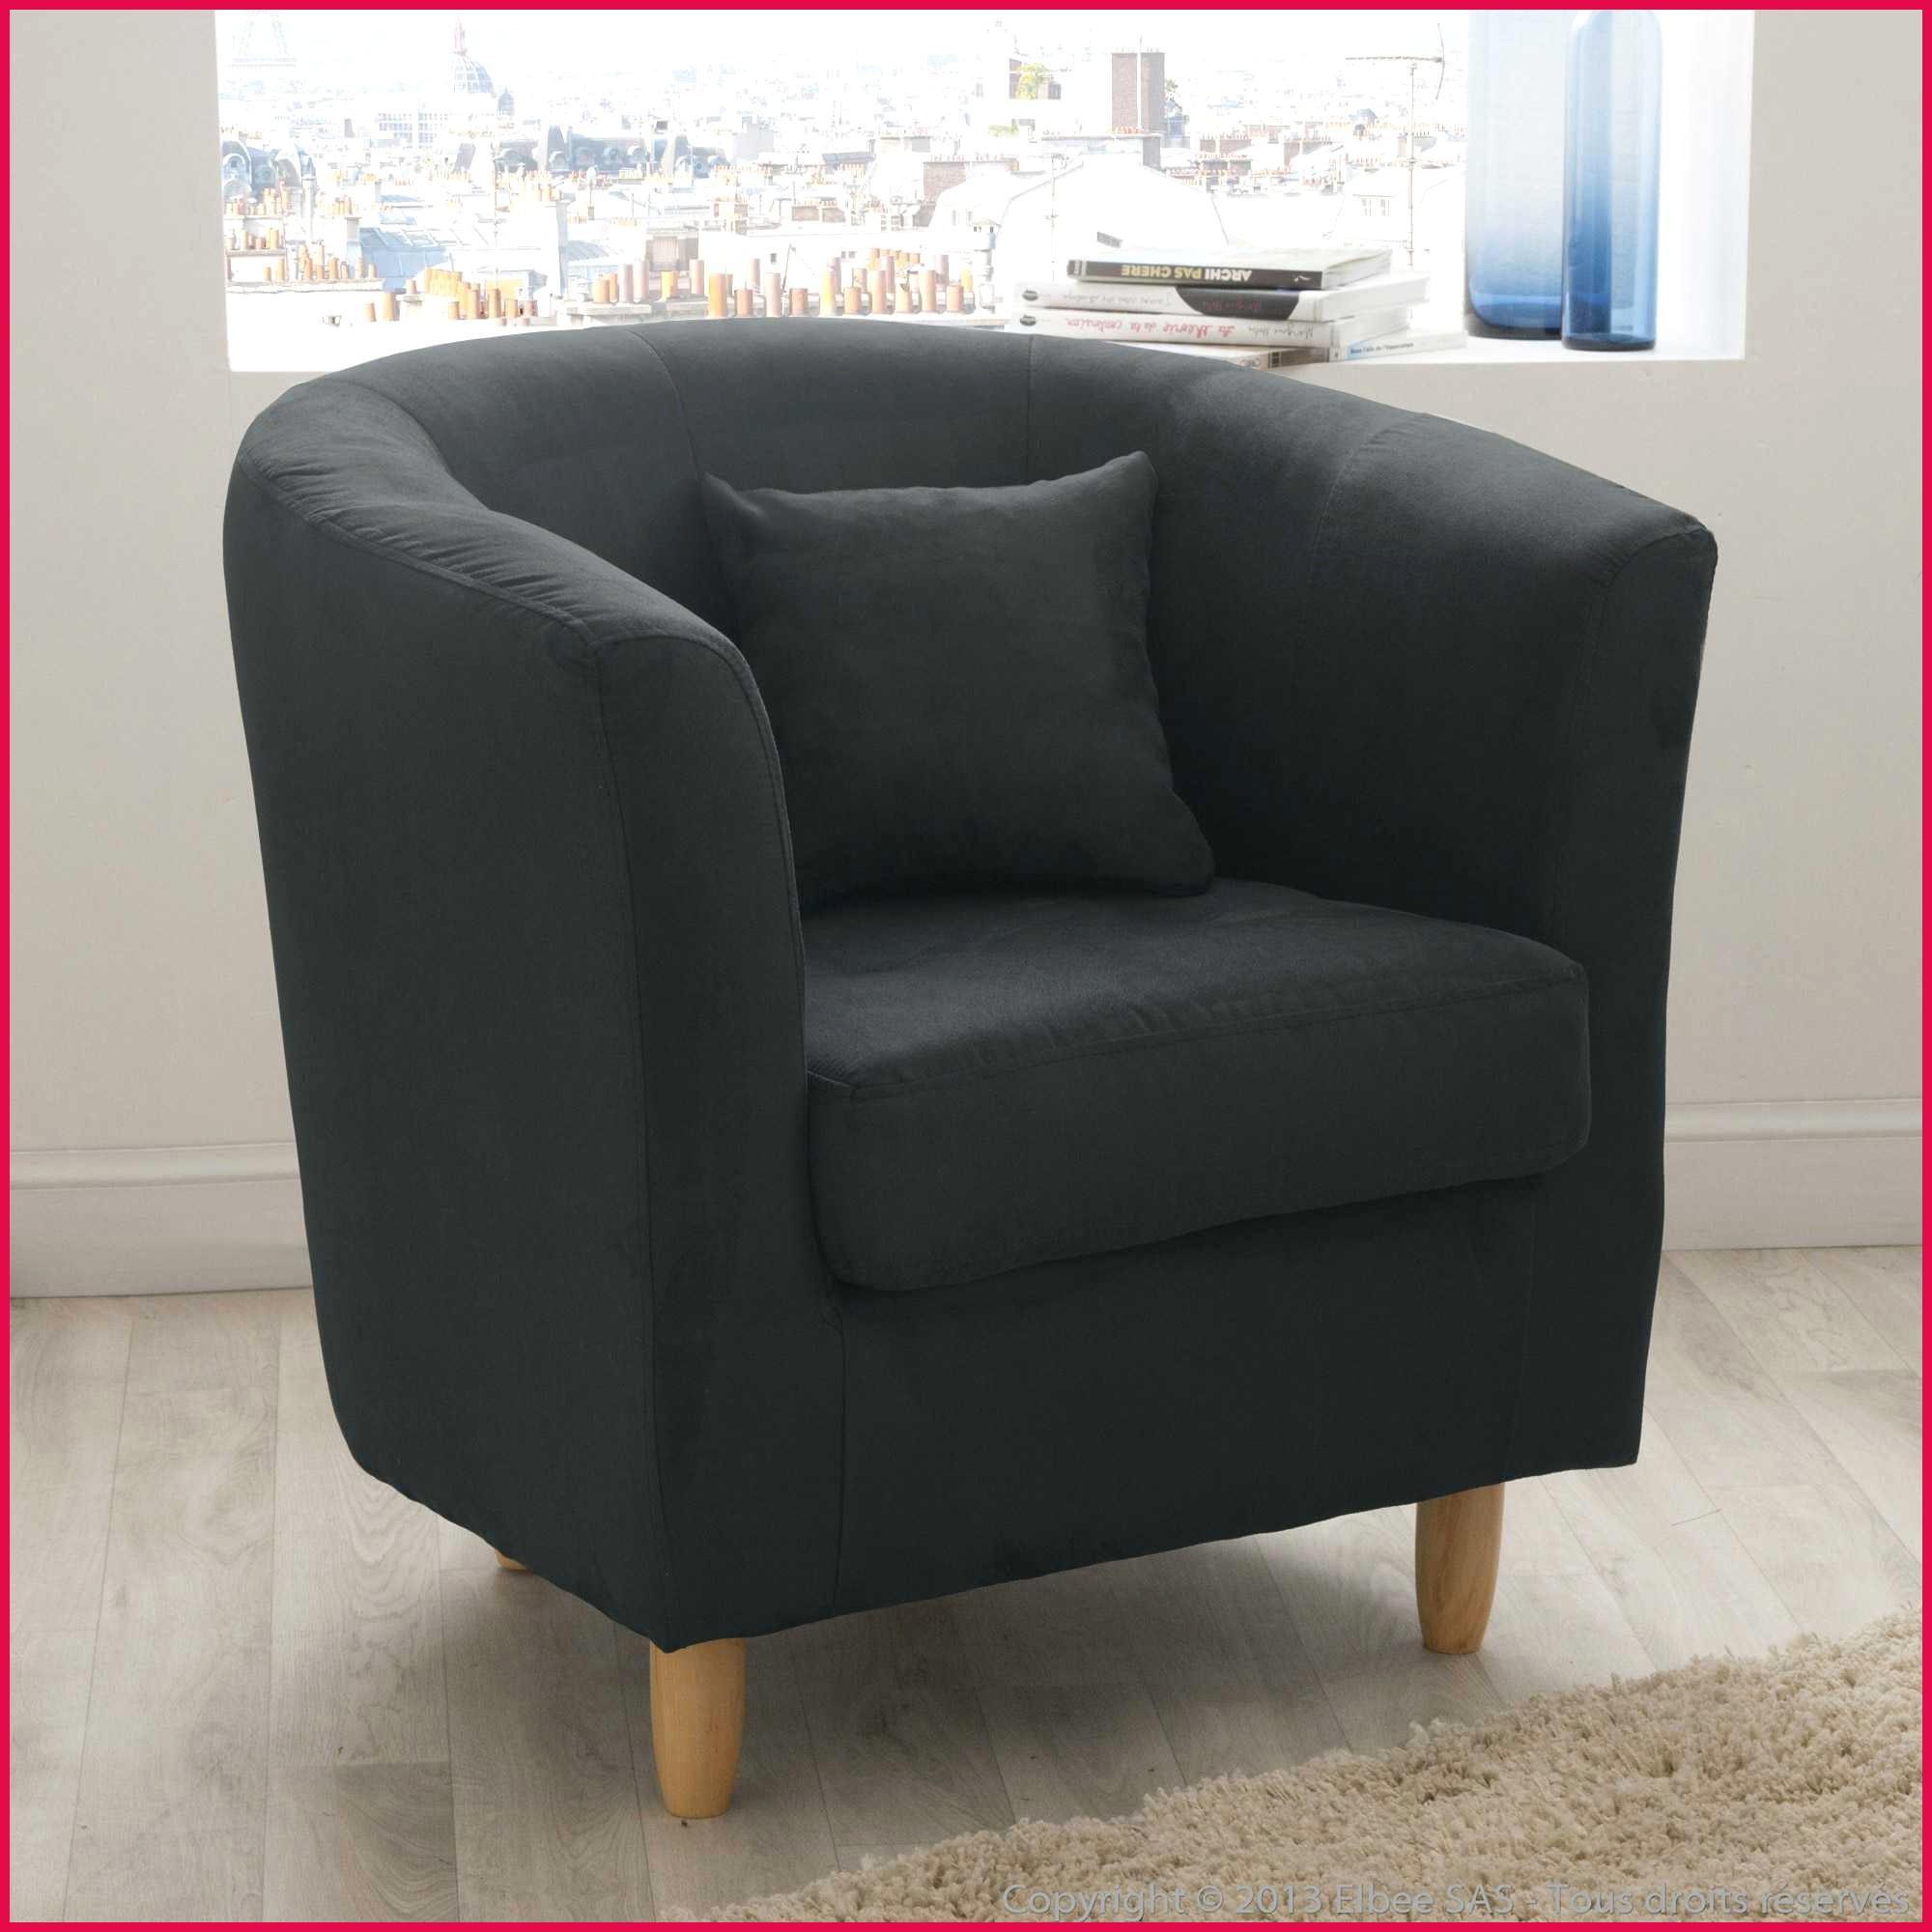 cabriolet fauteuil ikea. Black Bedroom Furniture Sets. Home Design Ideas